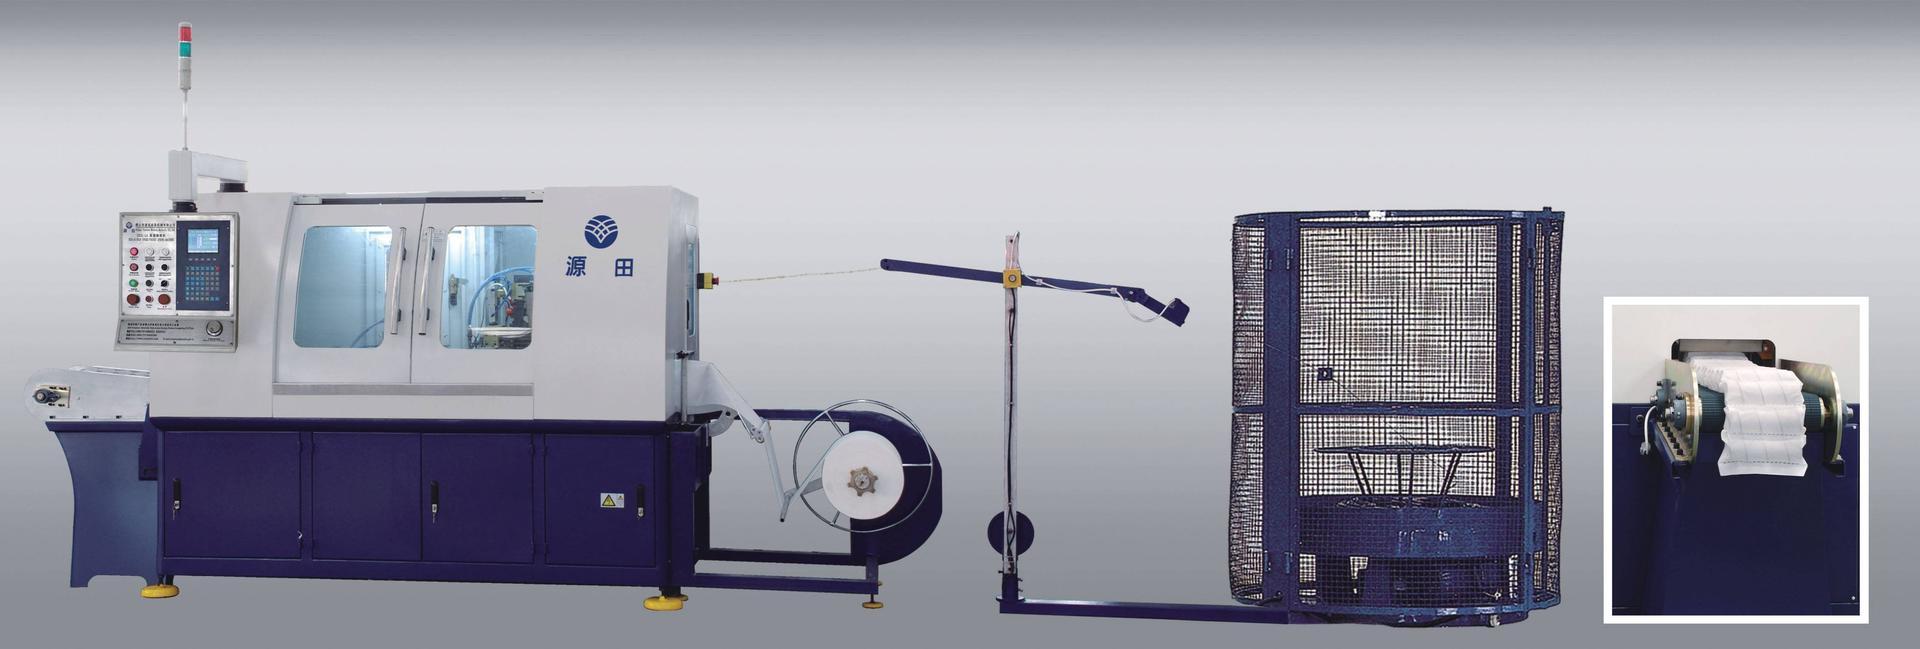 DZG-1A数控袋装弹簧机